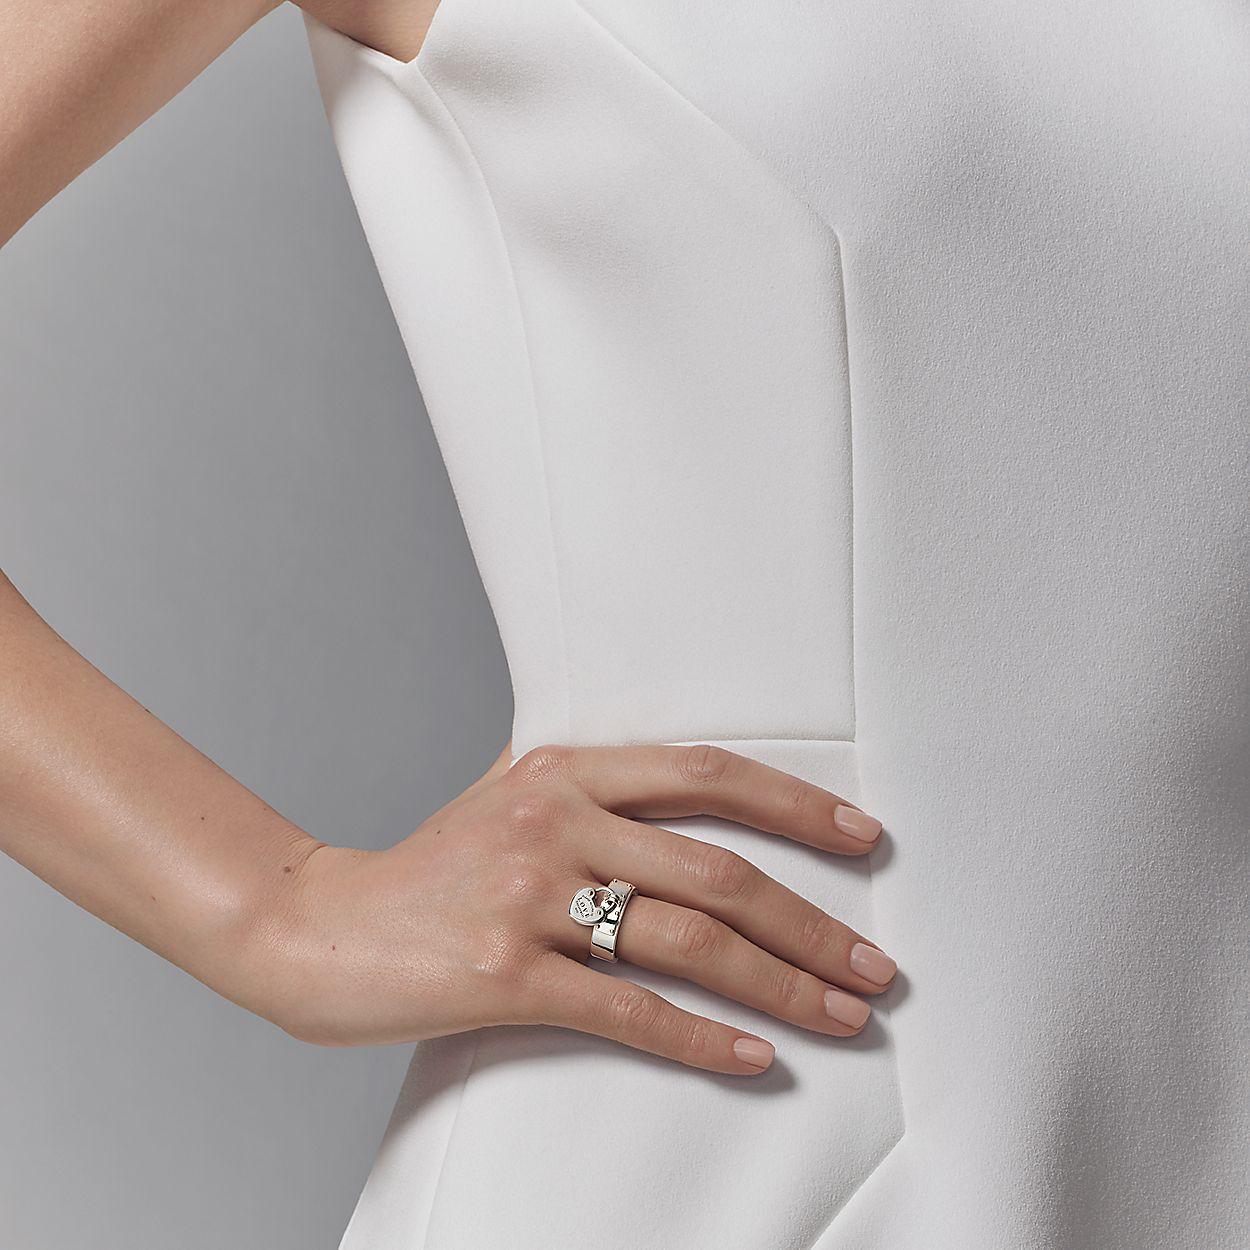 b5e25885ab Return to Tiffany™ Love lock ring in sterling silver. | Tiffany & Co.